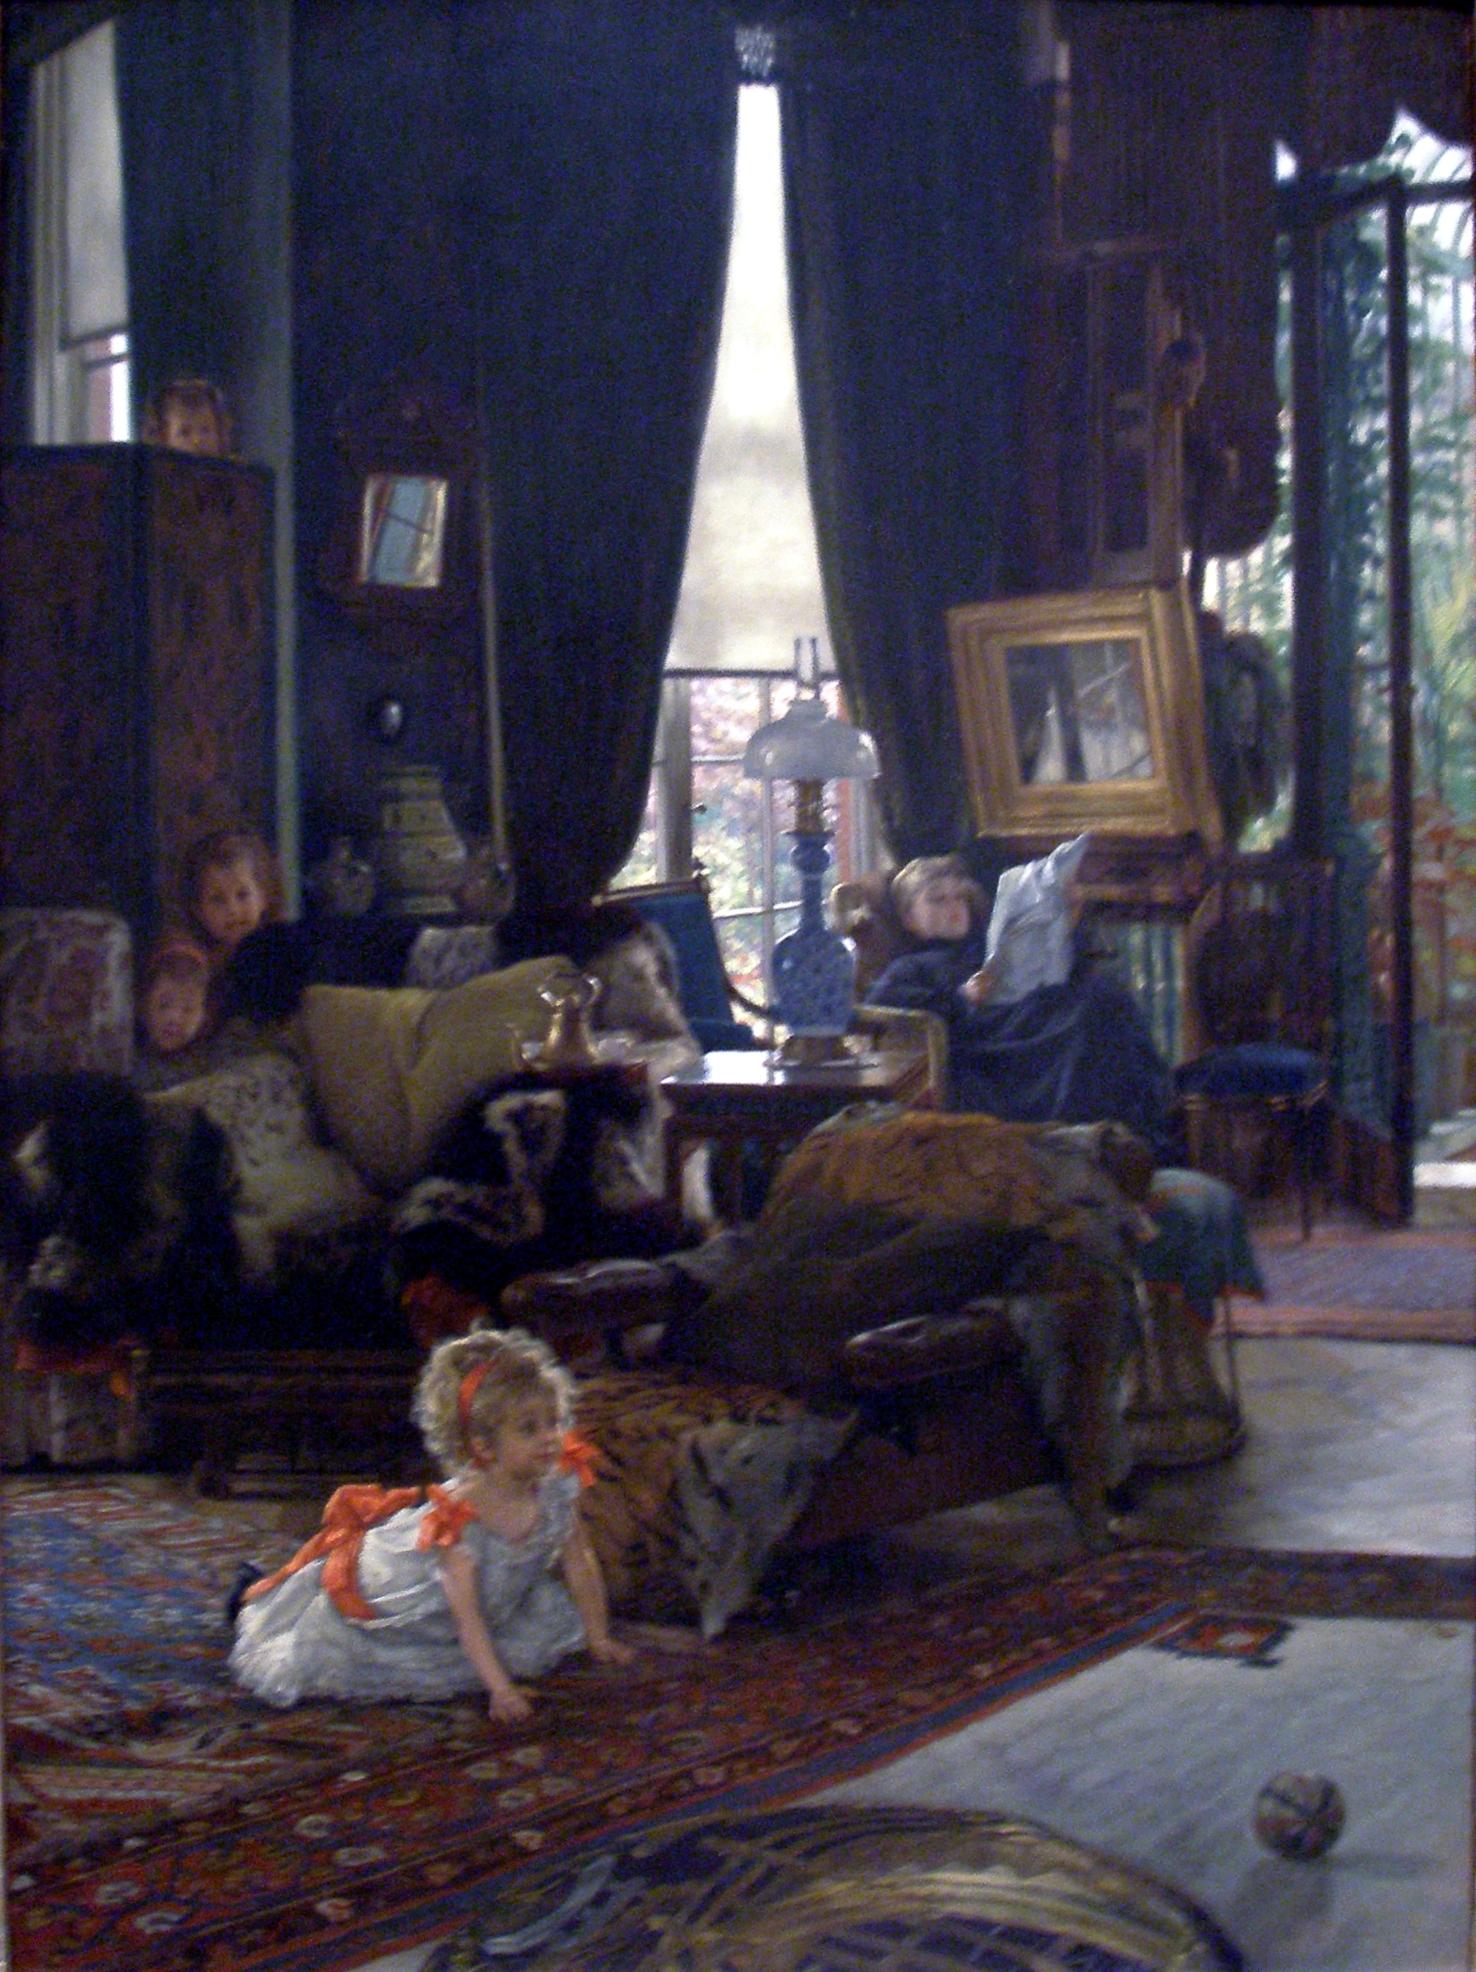 https://i1.wp.com/upload.wikimedia.org/wikipedia/commons/f/f9/Hide_and_Seek-1877-James_Jacques_Joseph_Tissot.jpg